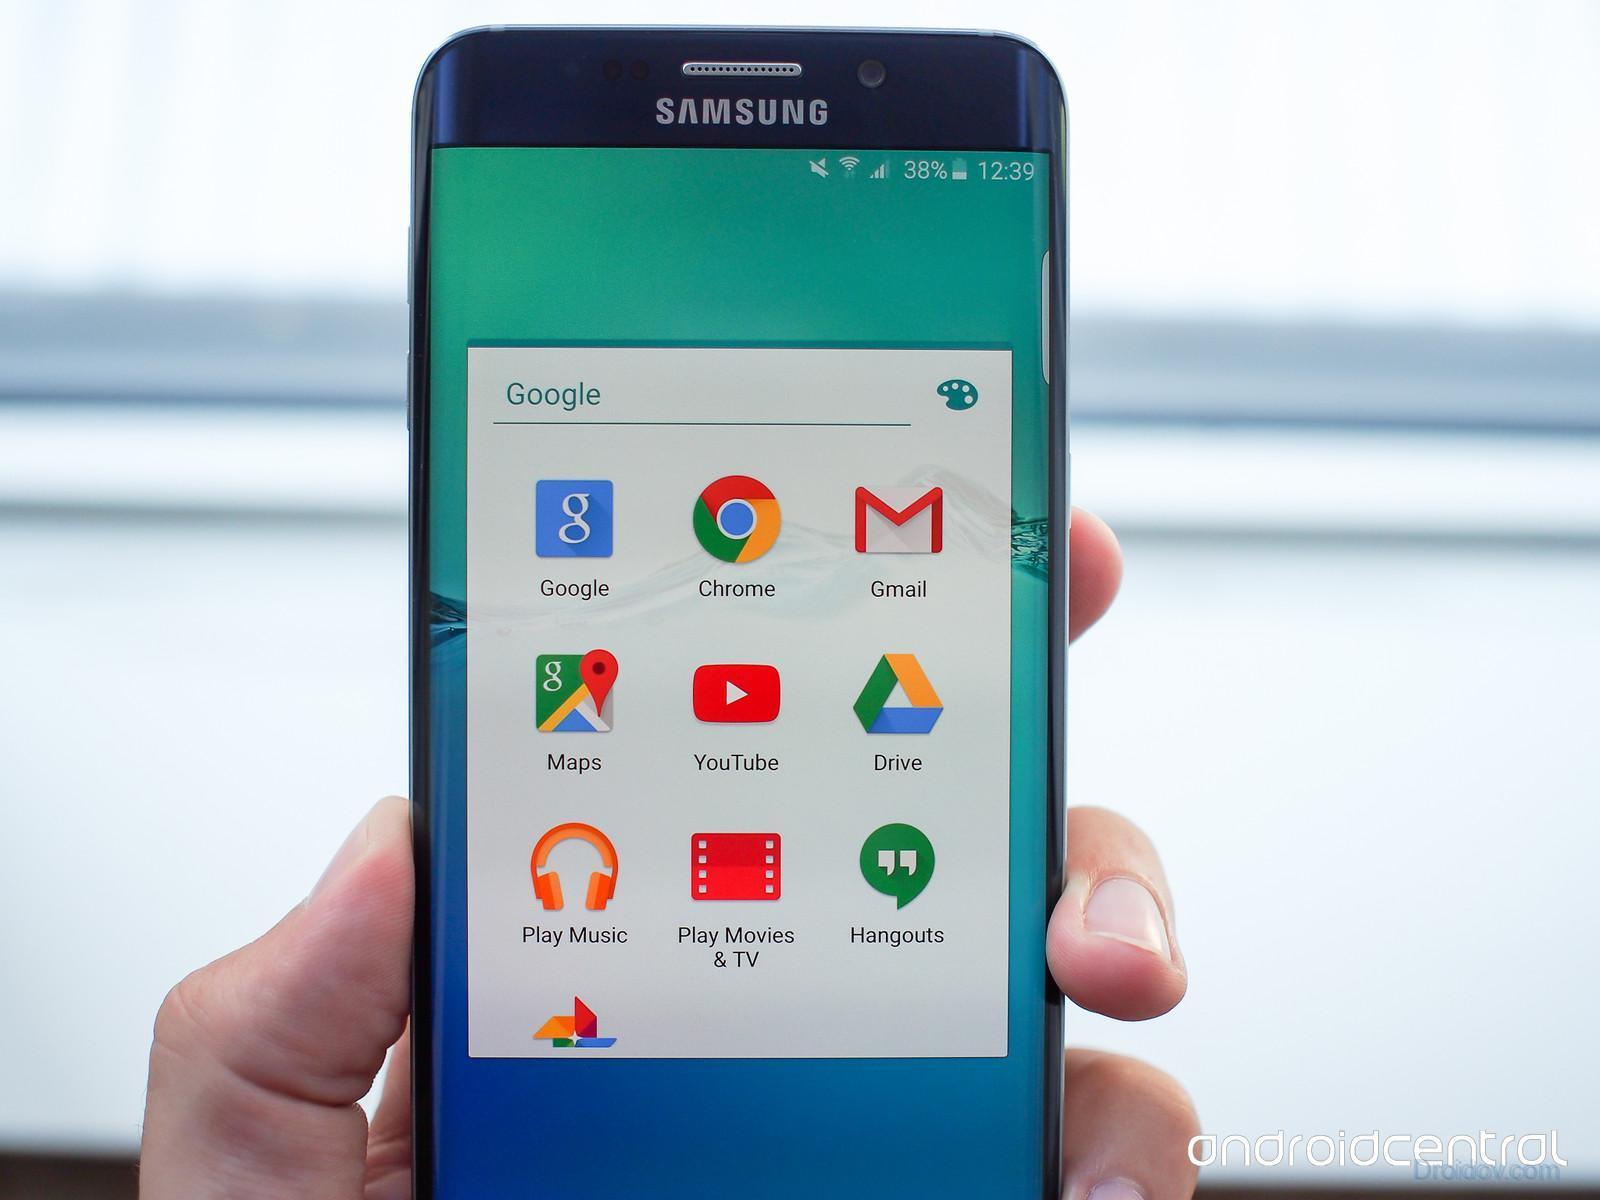 google-app-folder-galaxy-s6-edge-plus